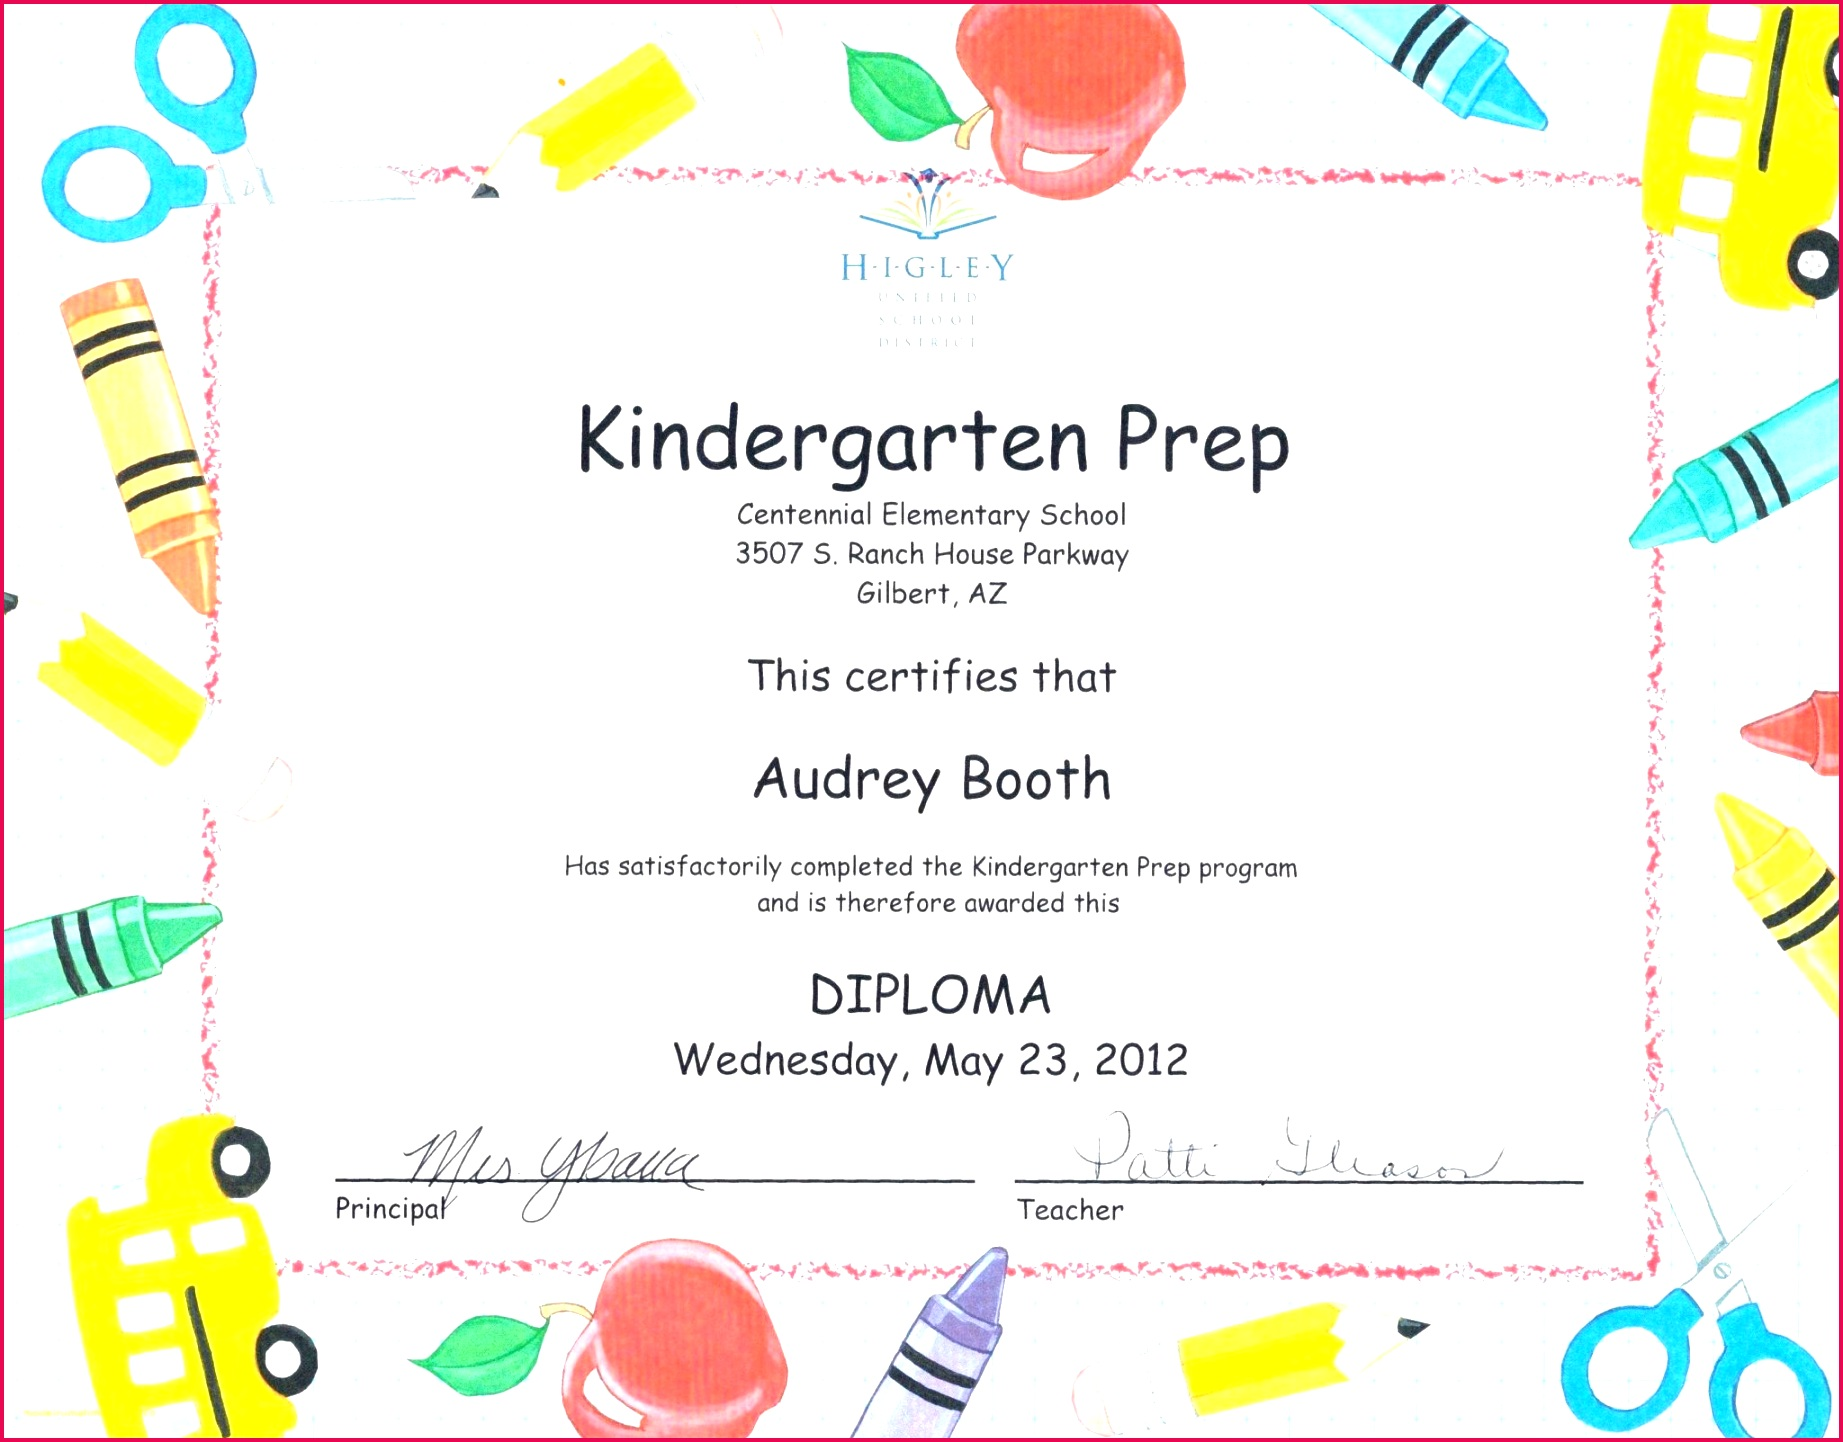 graduation certificate template and elegant free invitation templates for word of graduation certificate template